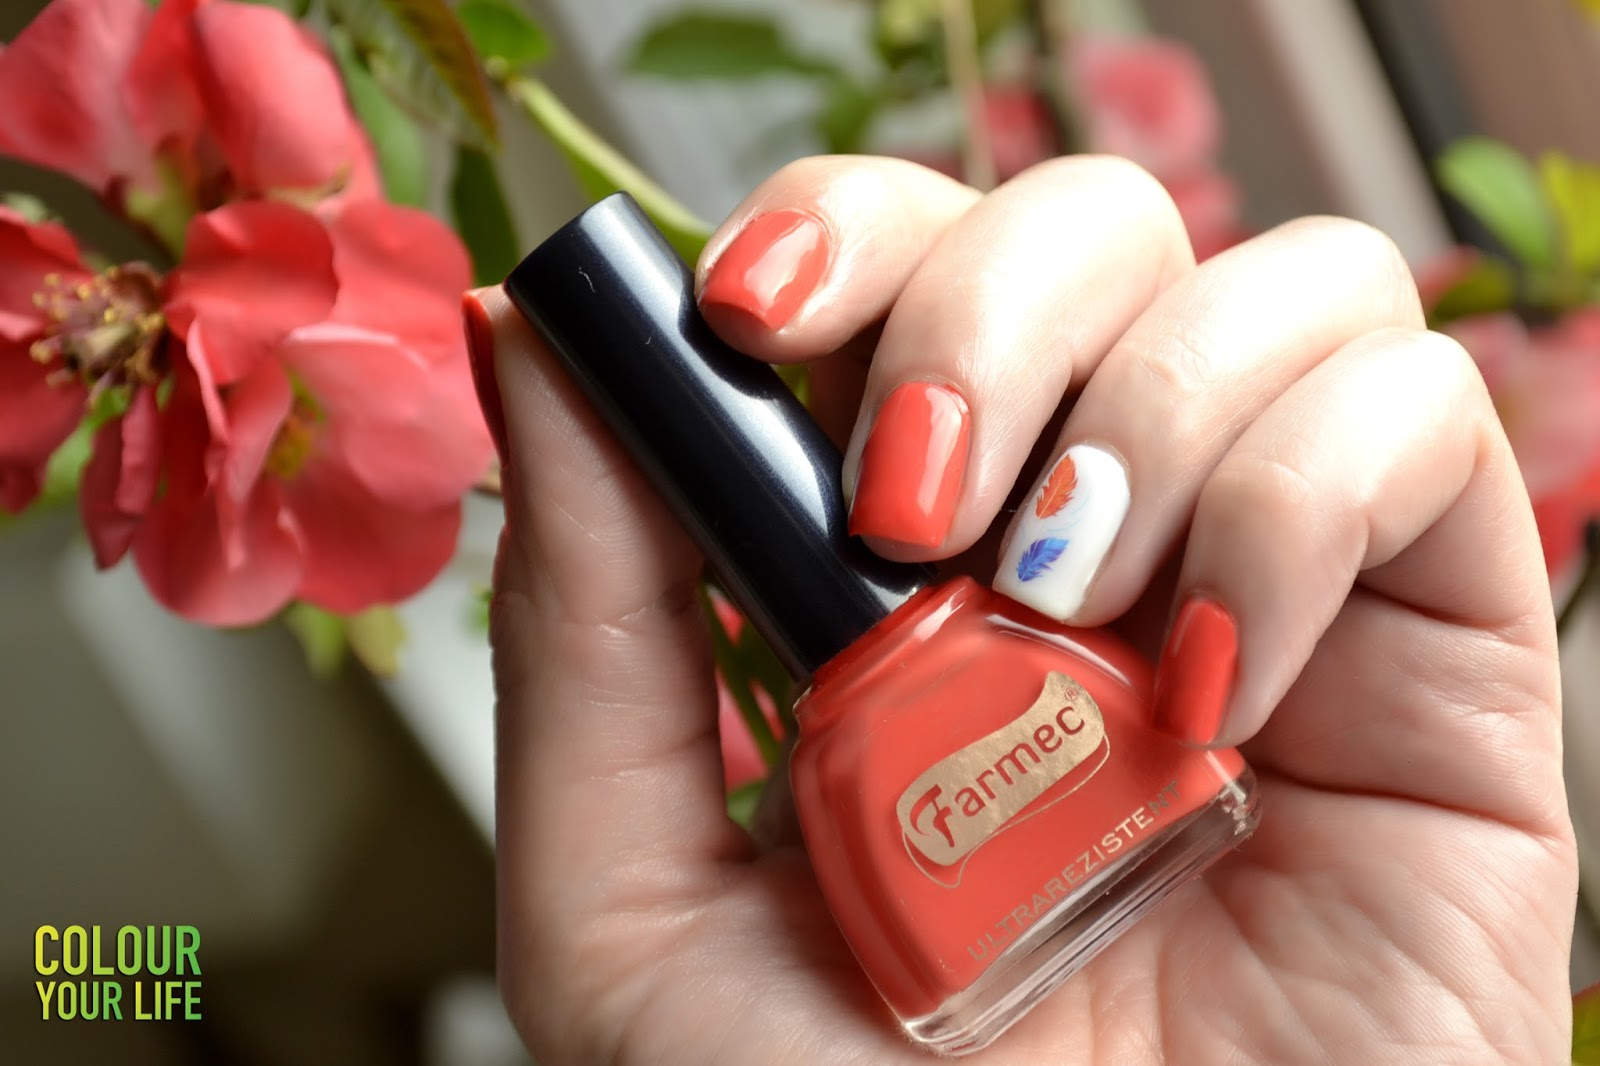 Colour your life: Bright spring color by Farmec